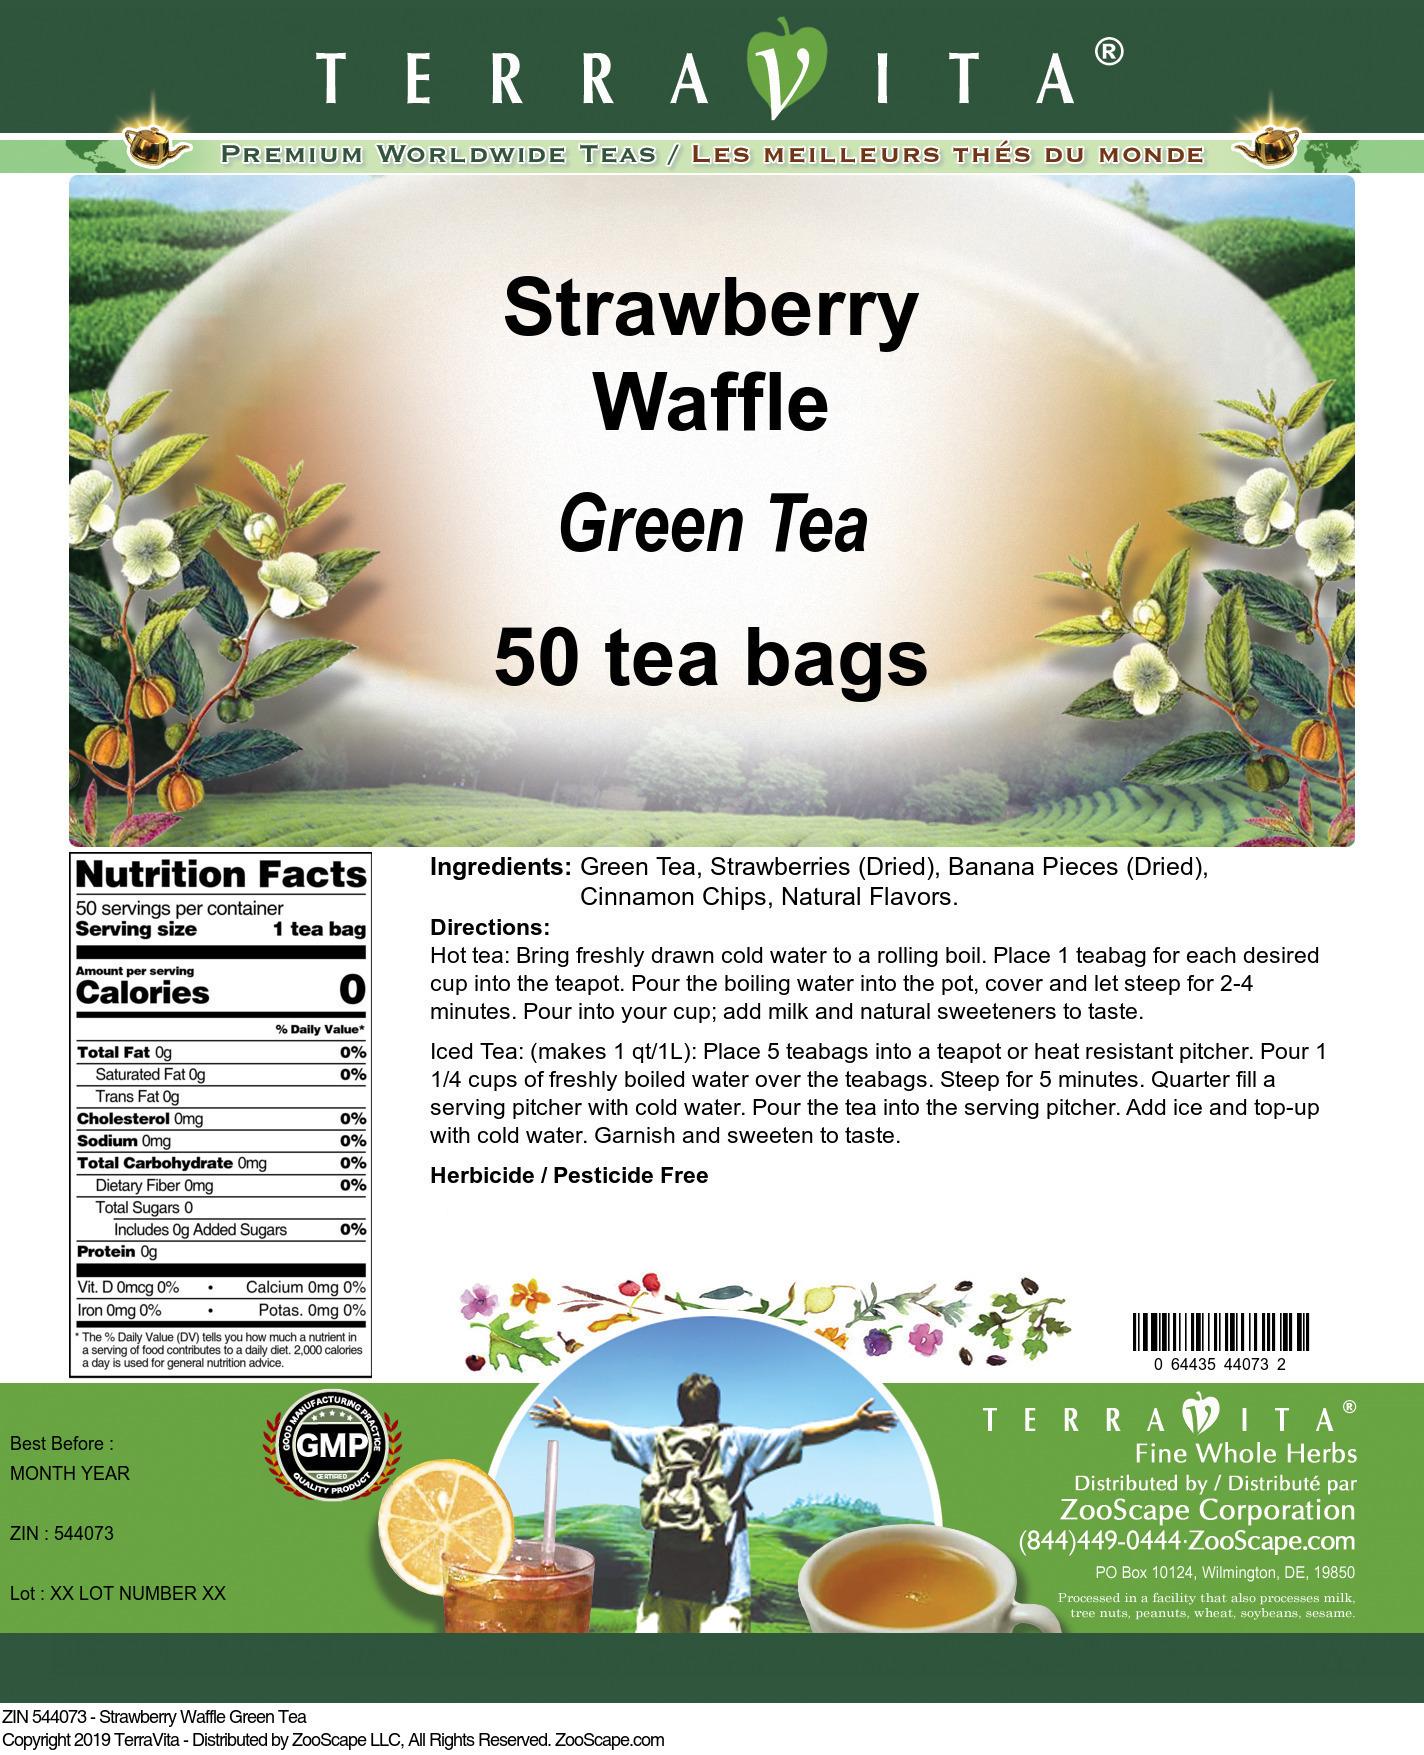 Strawberry Waffle Green Tea